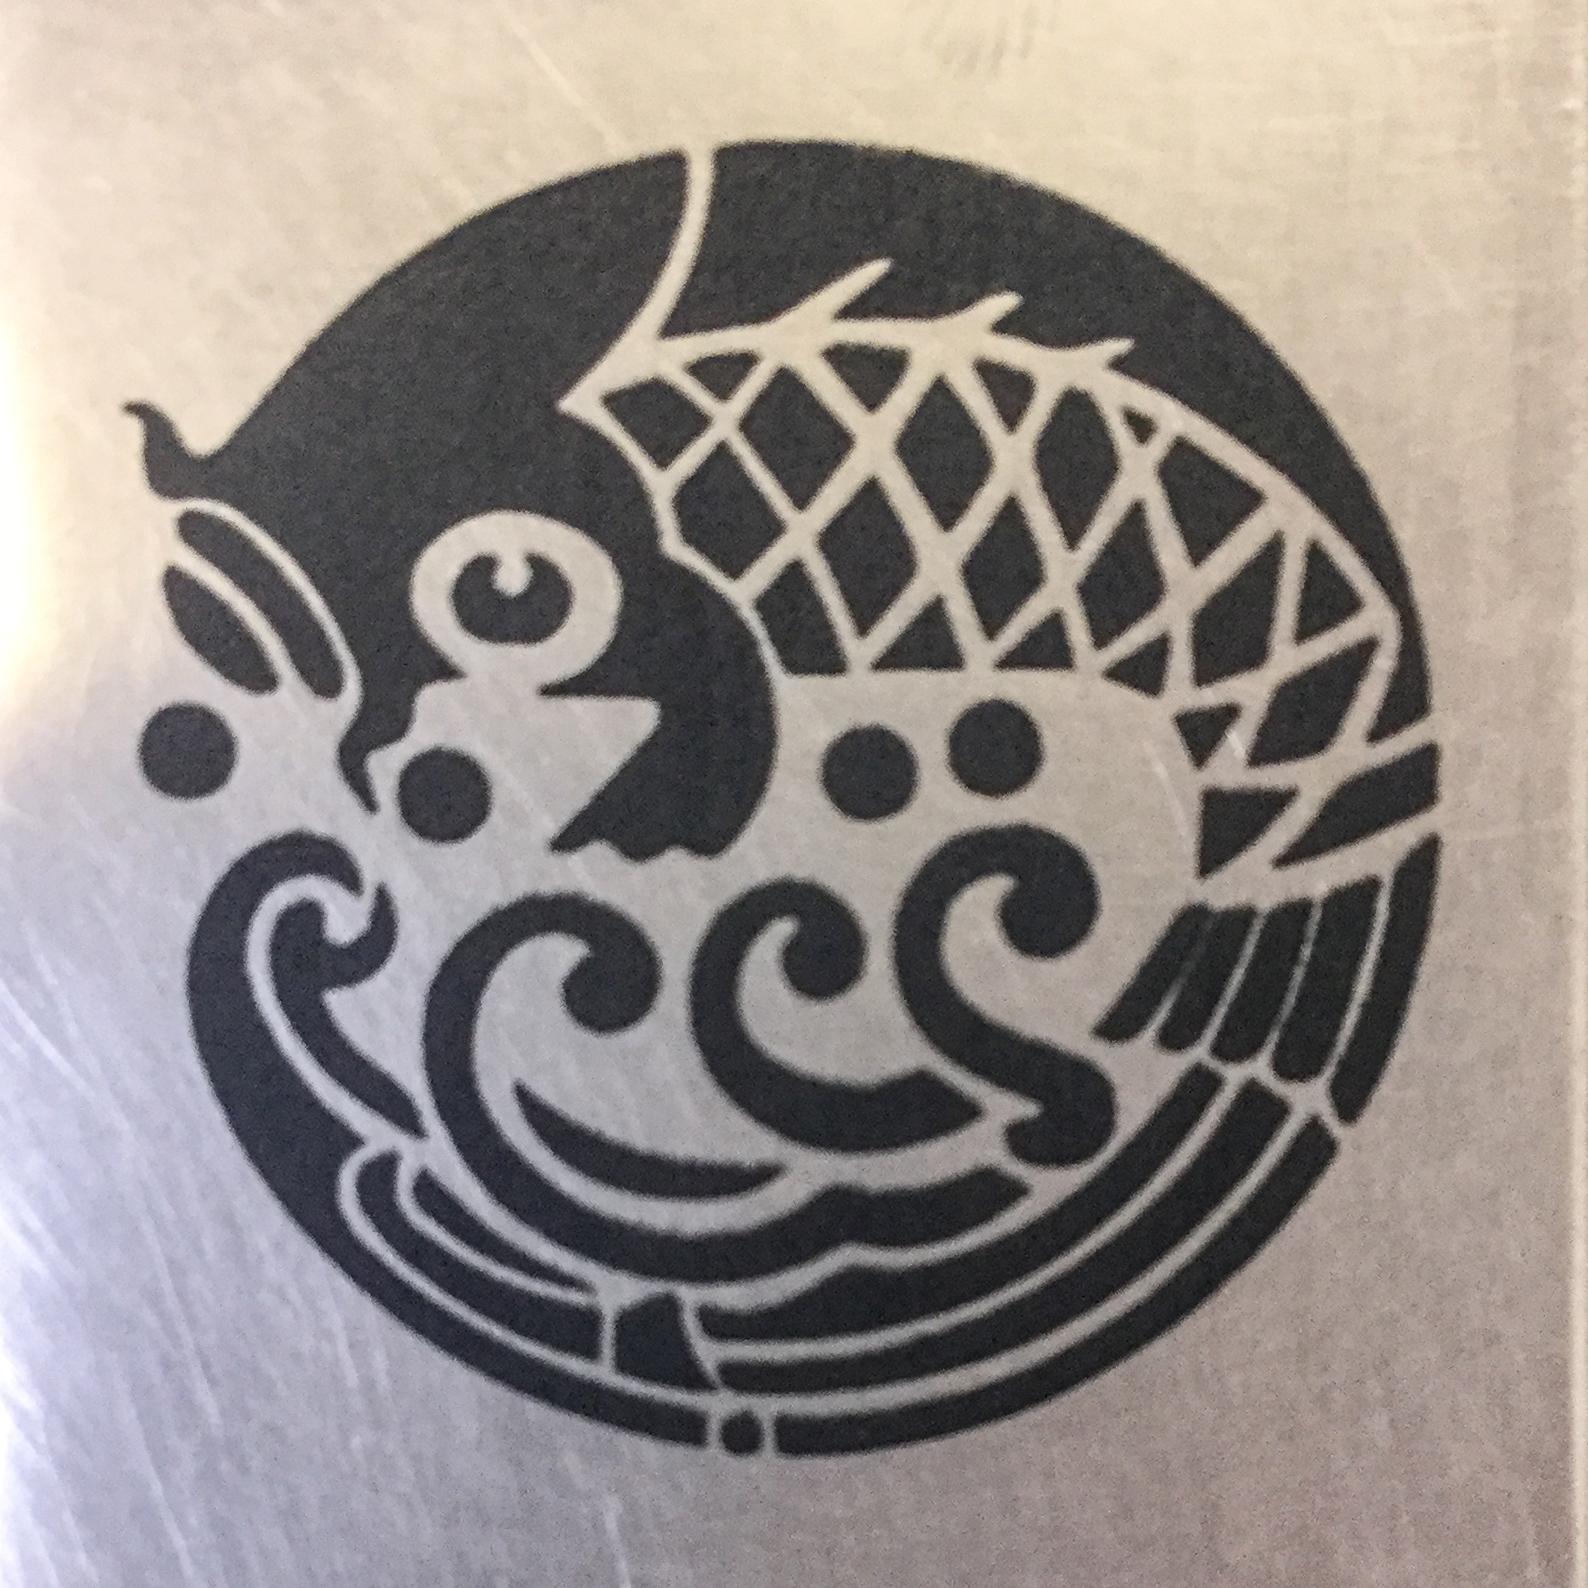 laser marked/surface engraved metal